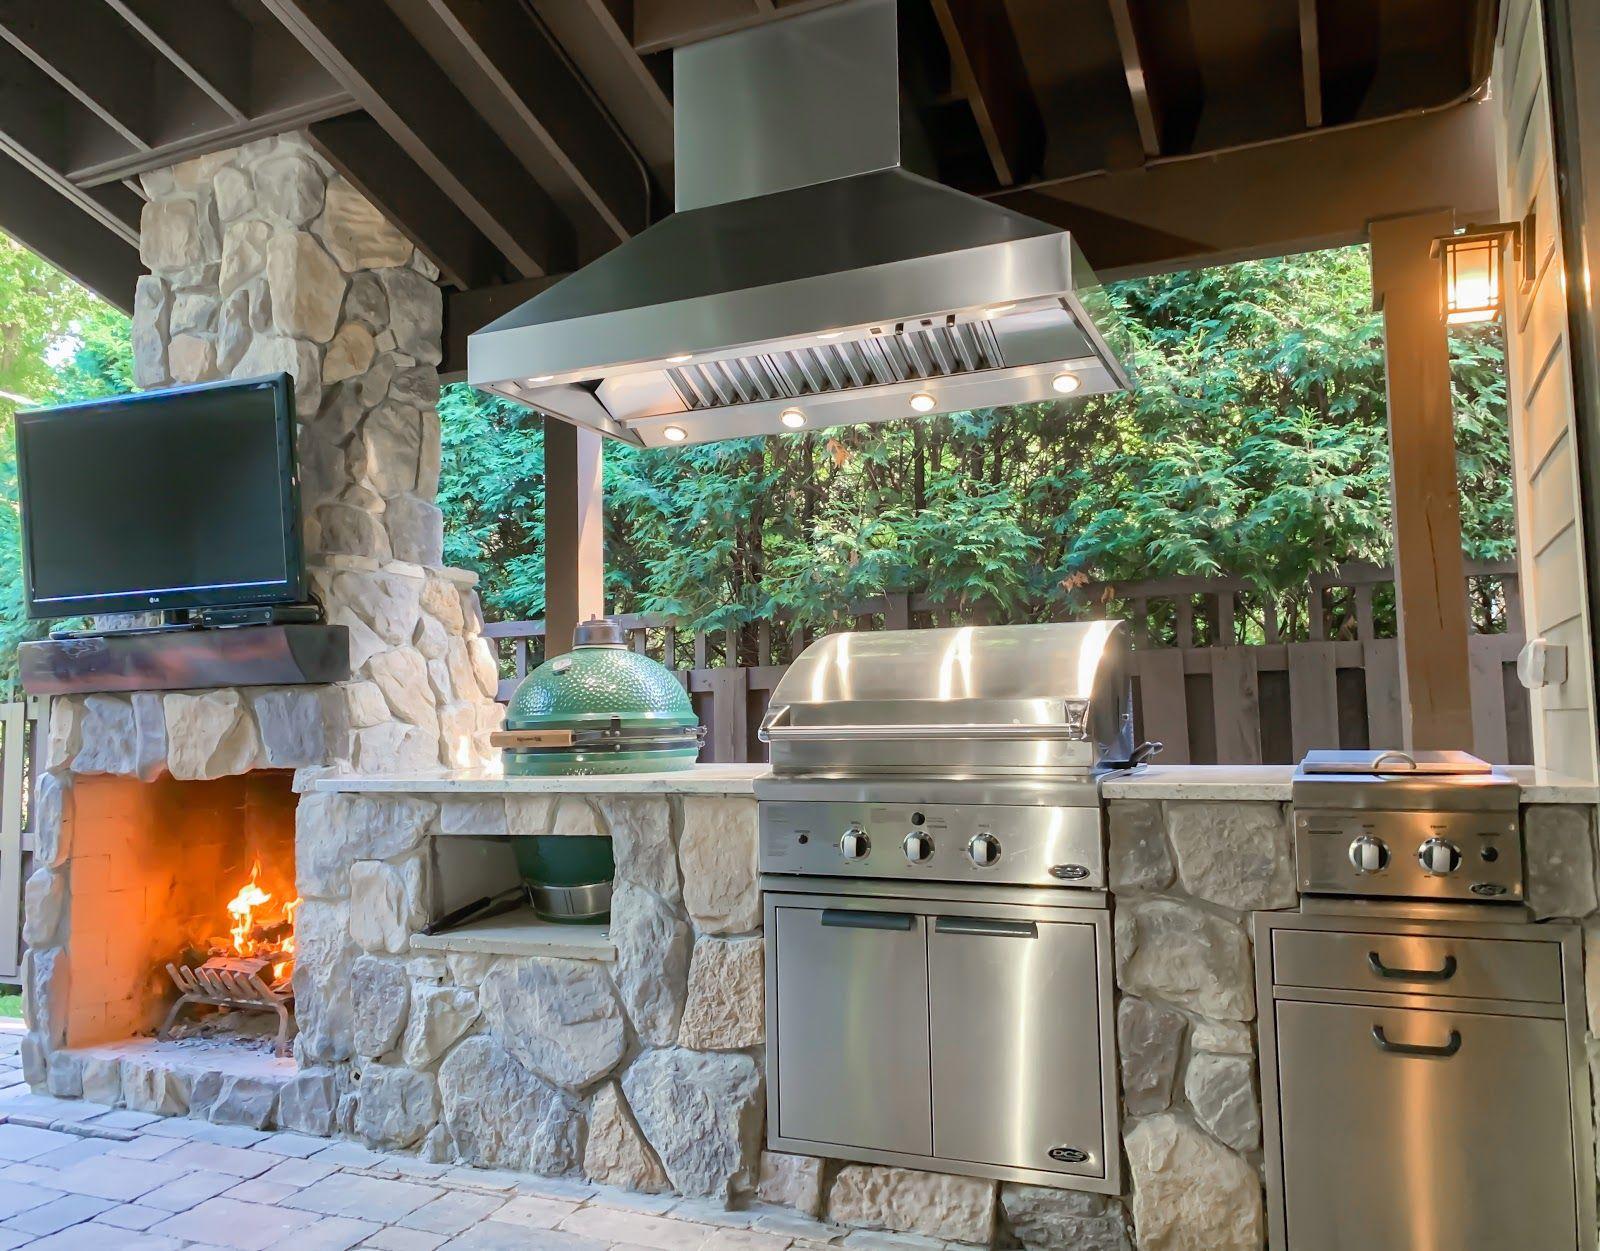 111 inspirational kitchen hood ideas outdoor range hood kitchen hoods outdoor kitchen on outdoor kitchen vent hood ideas id=60718